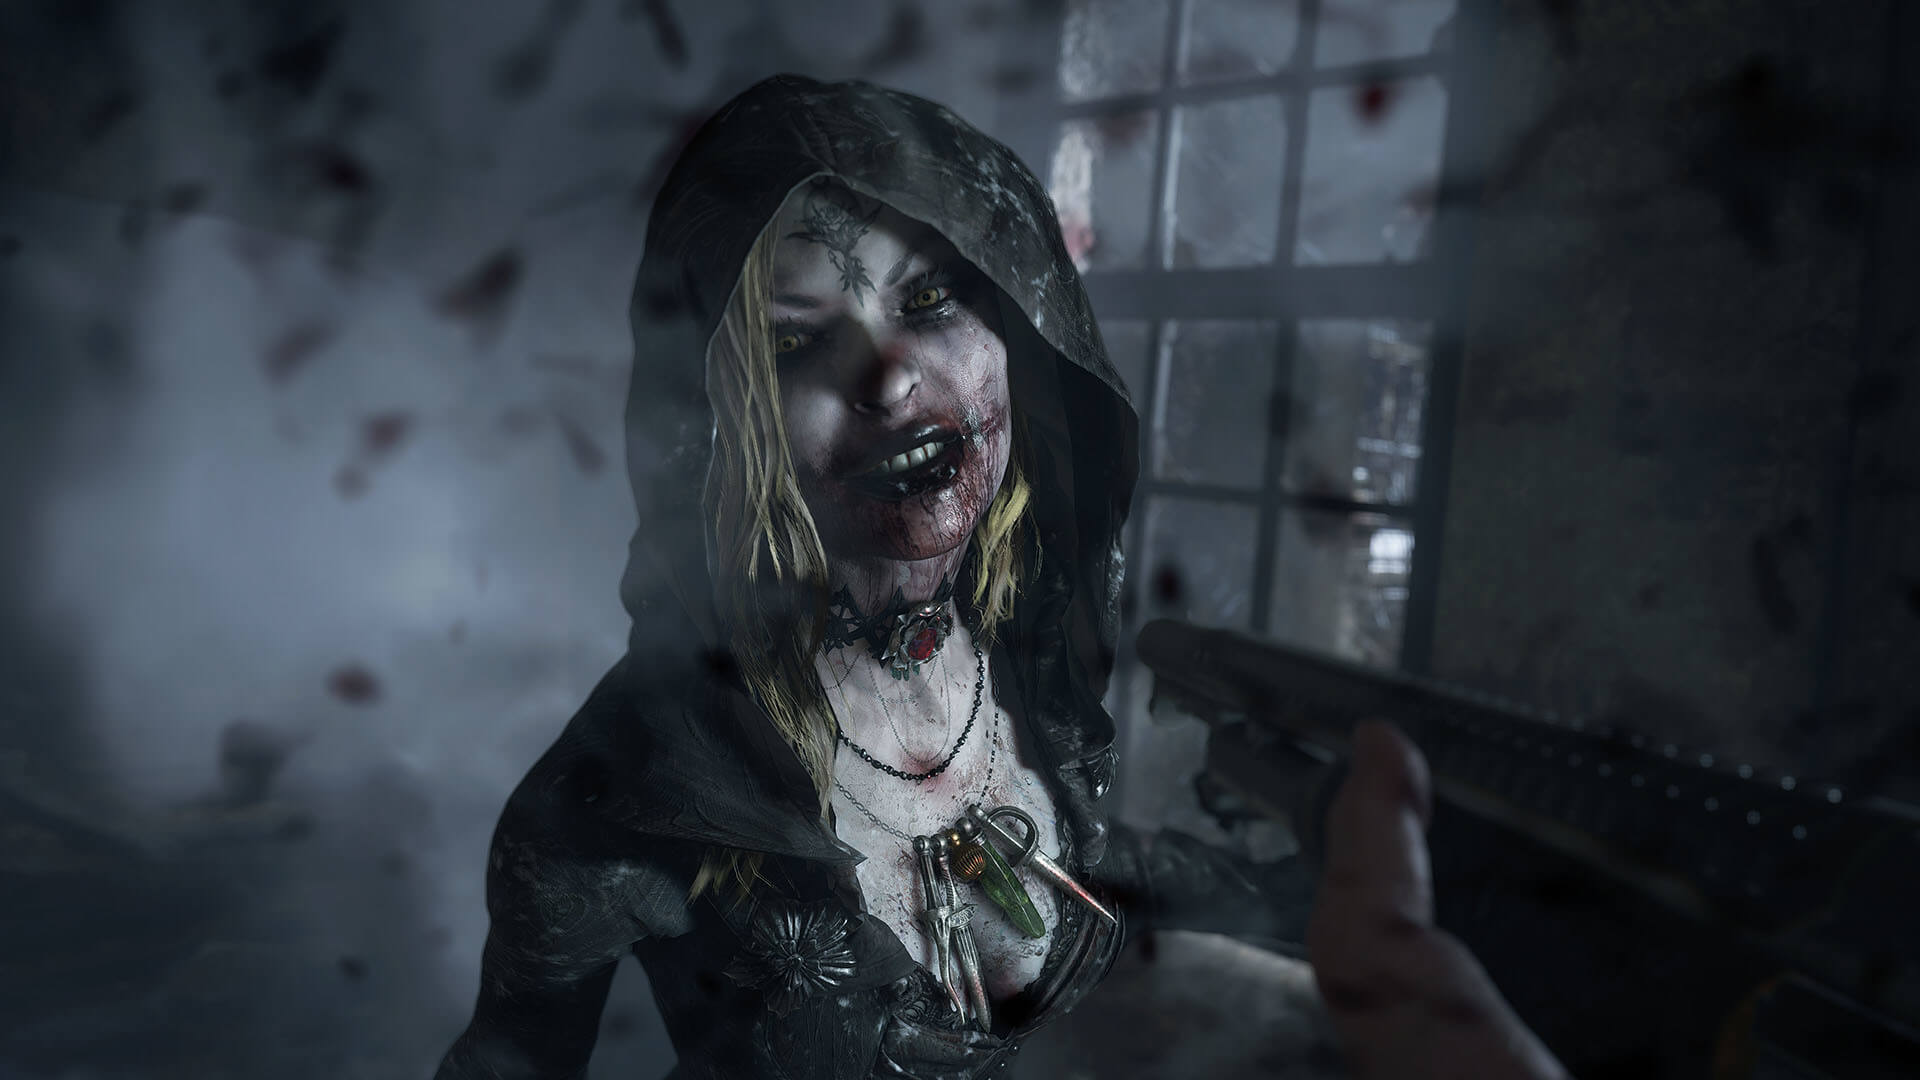 Resident Evil Village desvela nuevos detalles de las hijas de Lady Dimitrescu